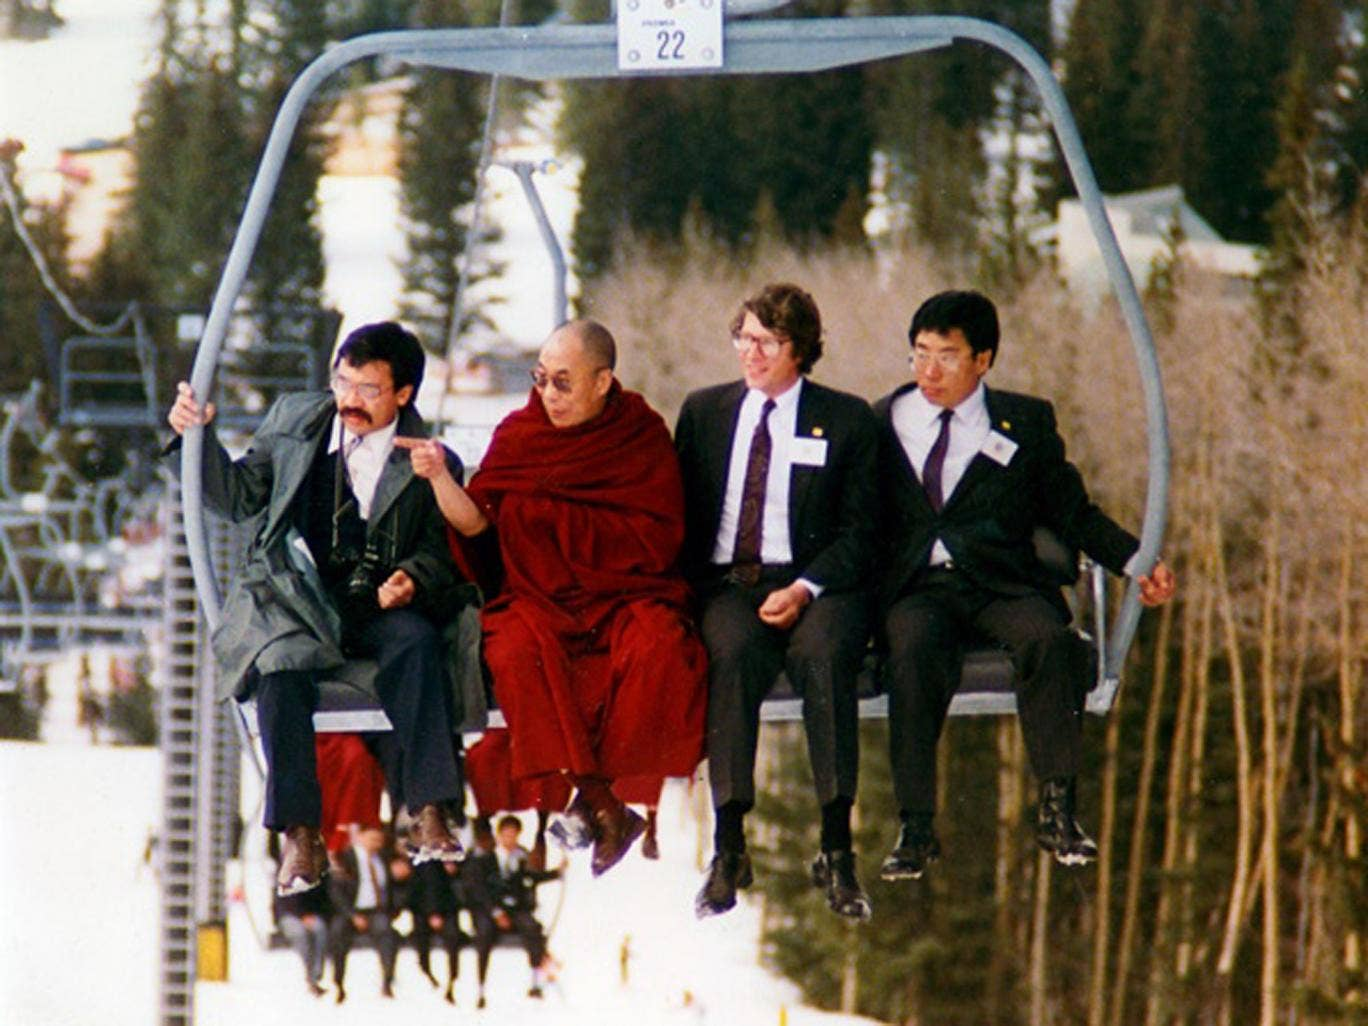 Snow job: the Dalai Lama on a ski-lift in Santa Fe, taken by the late Bob Shaw